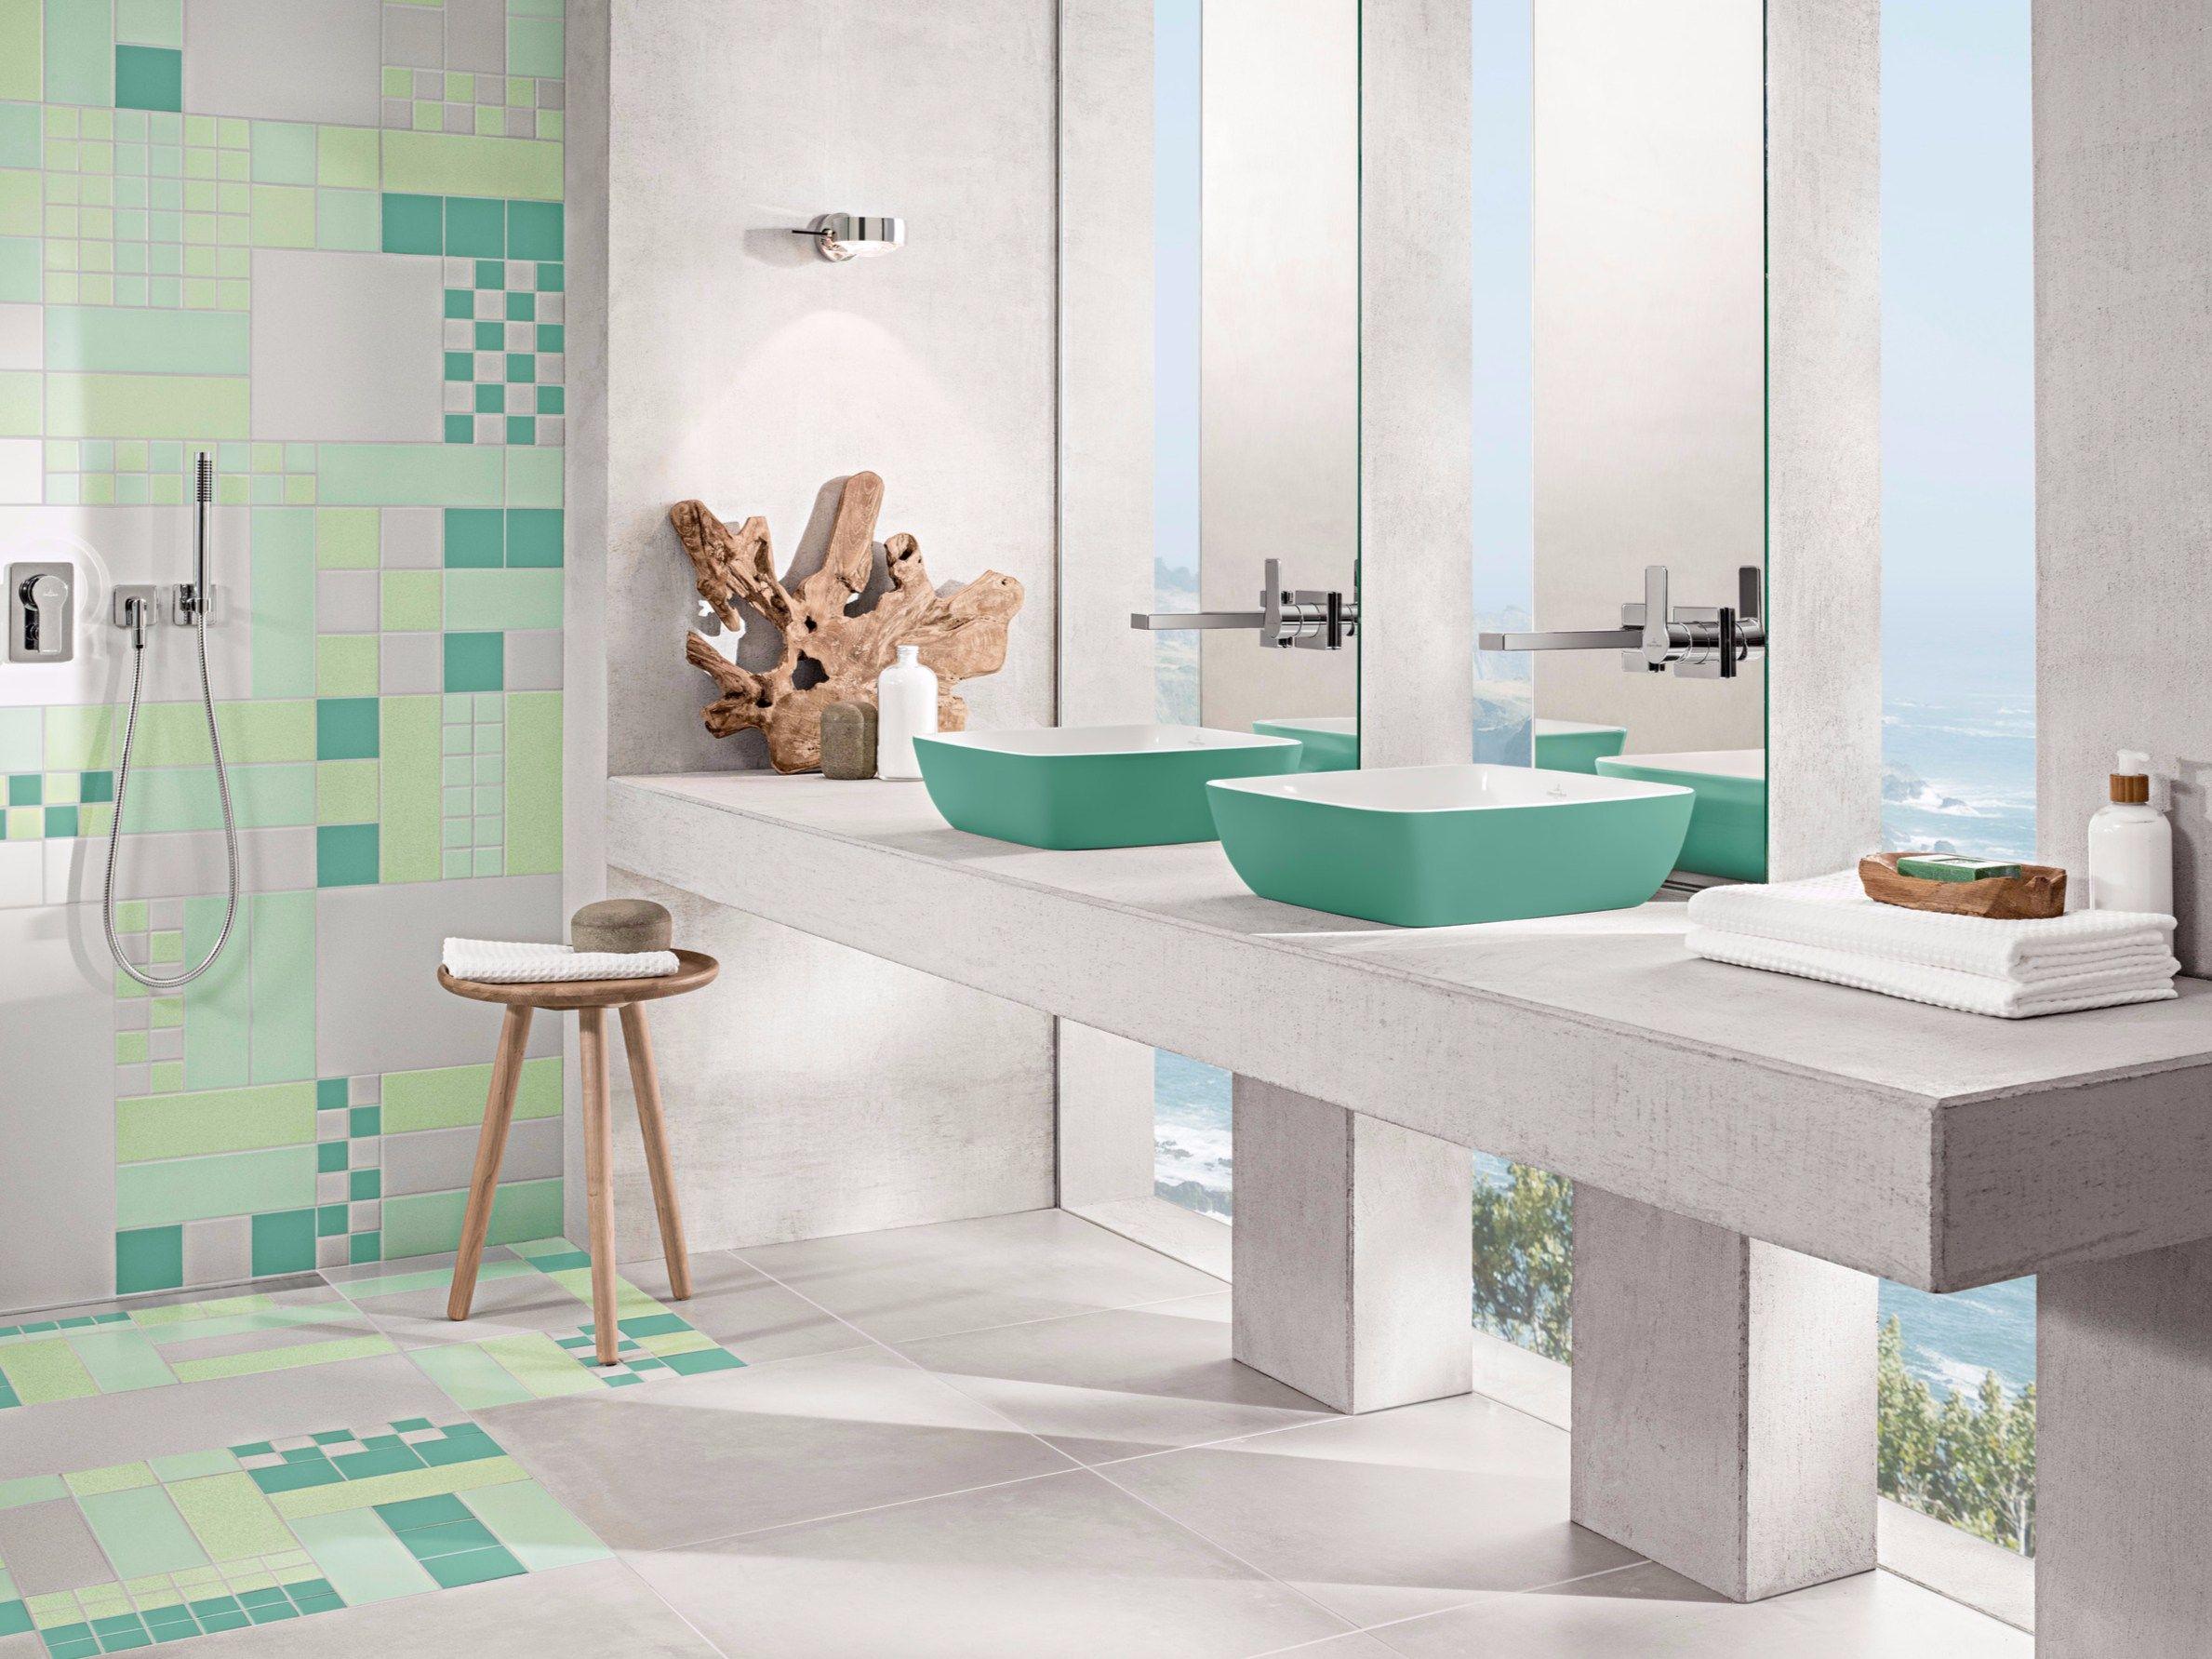 3d models bathroom accessories ceramic tiles venis artis - Countertop Titanceram Washbasin Artis Color Line By Villeroy Boch Design Gesa Hansen Countertopbathrooms